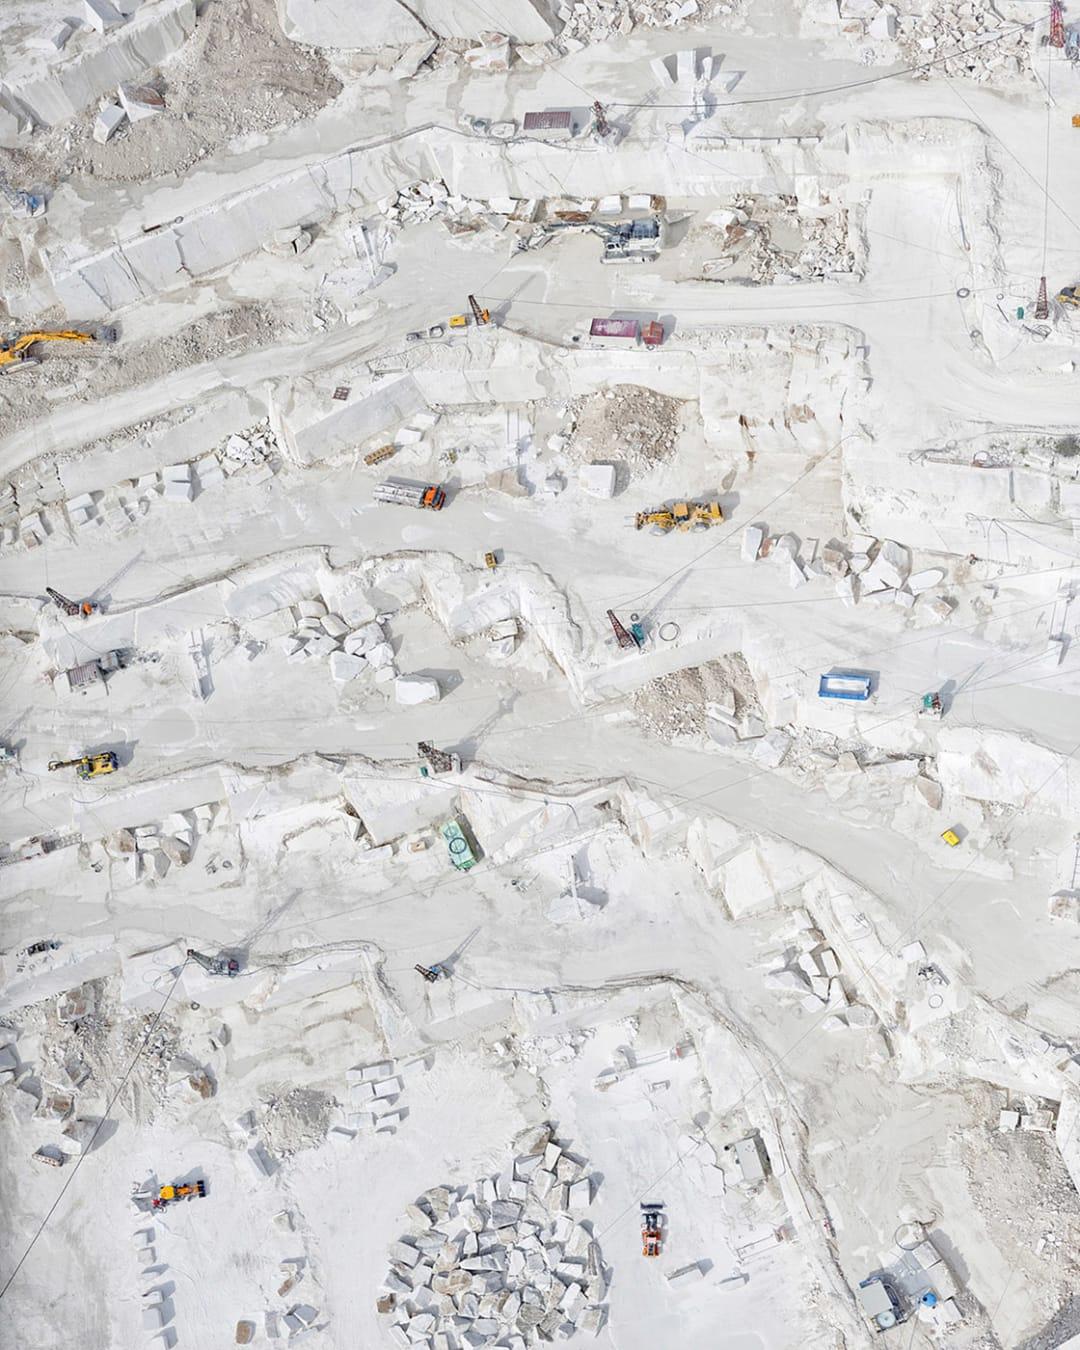 David Burdeny- Cava Bianco VII, Carrara, IT, 2018